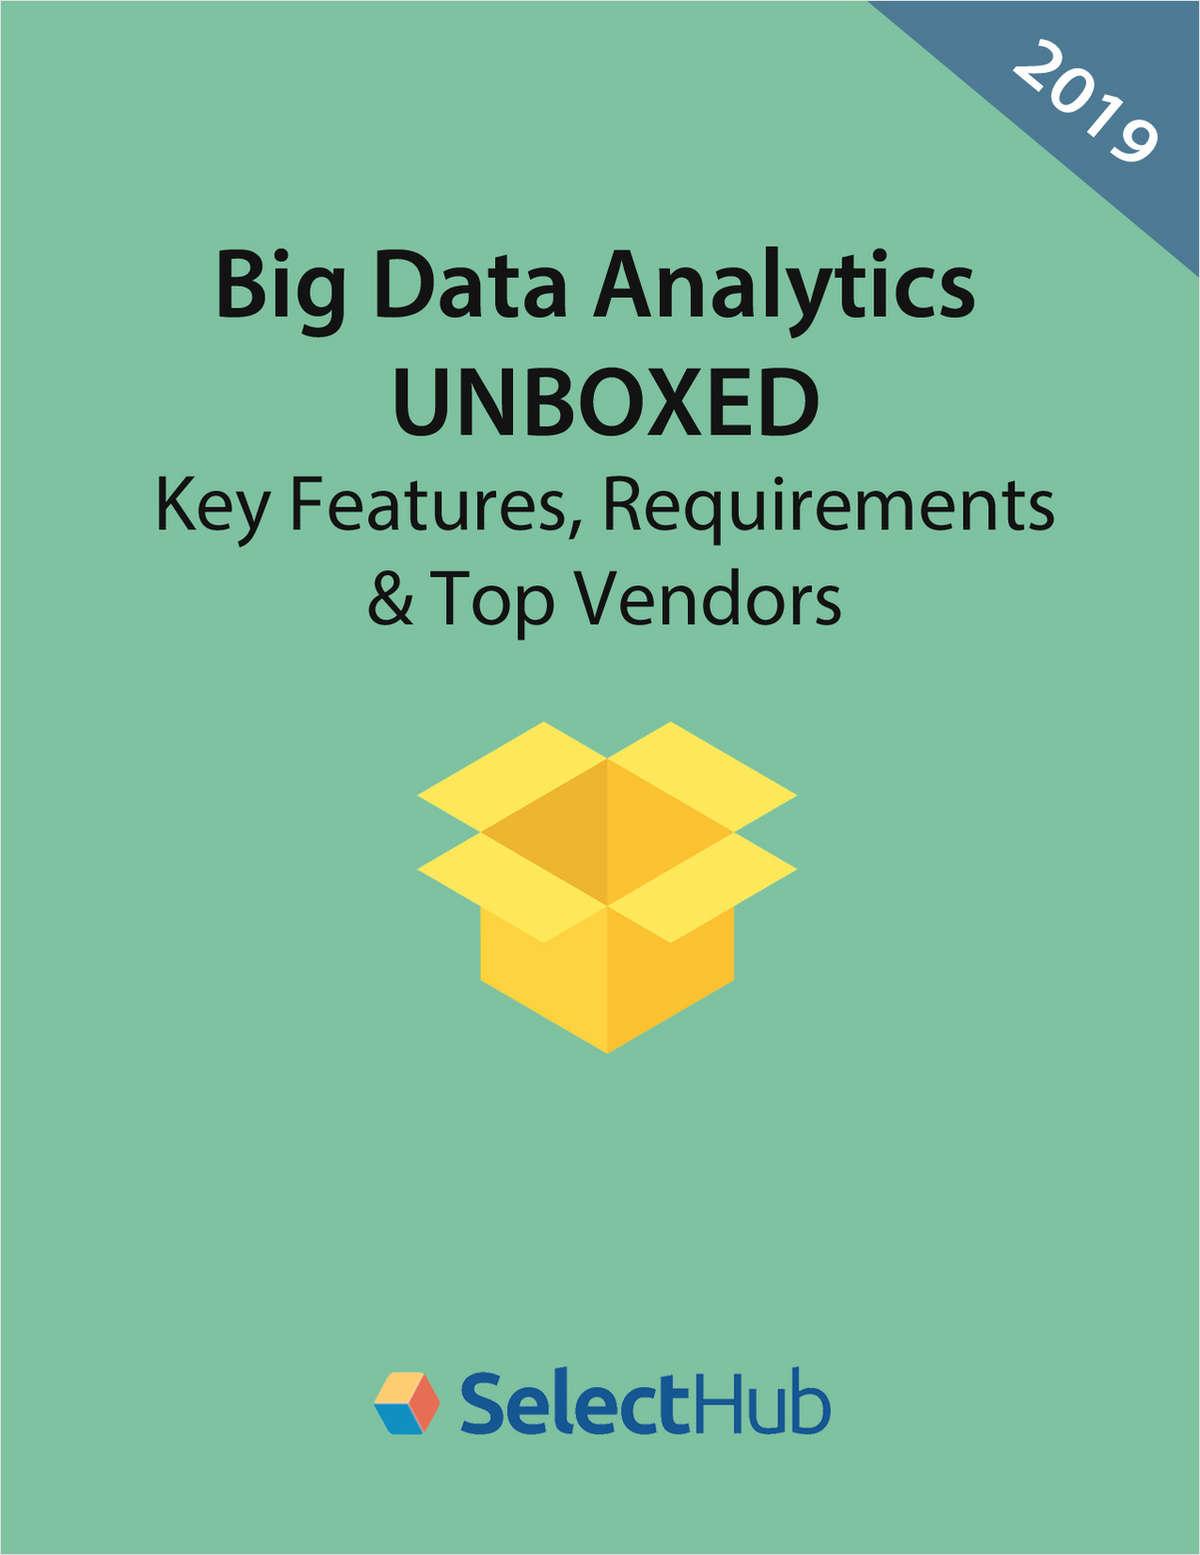 Big Data Analytics Tools-- Features & Requirements Checklist